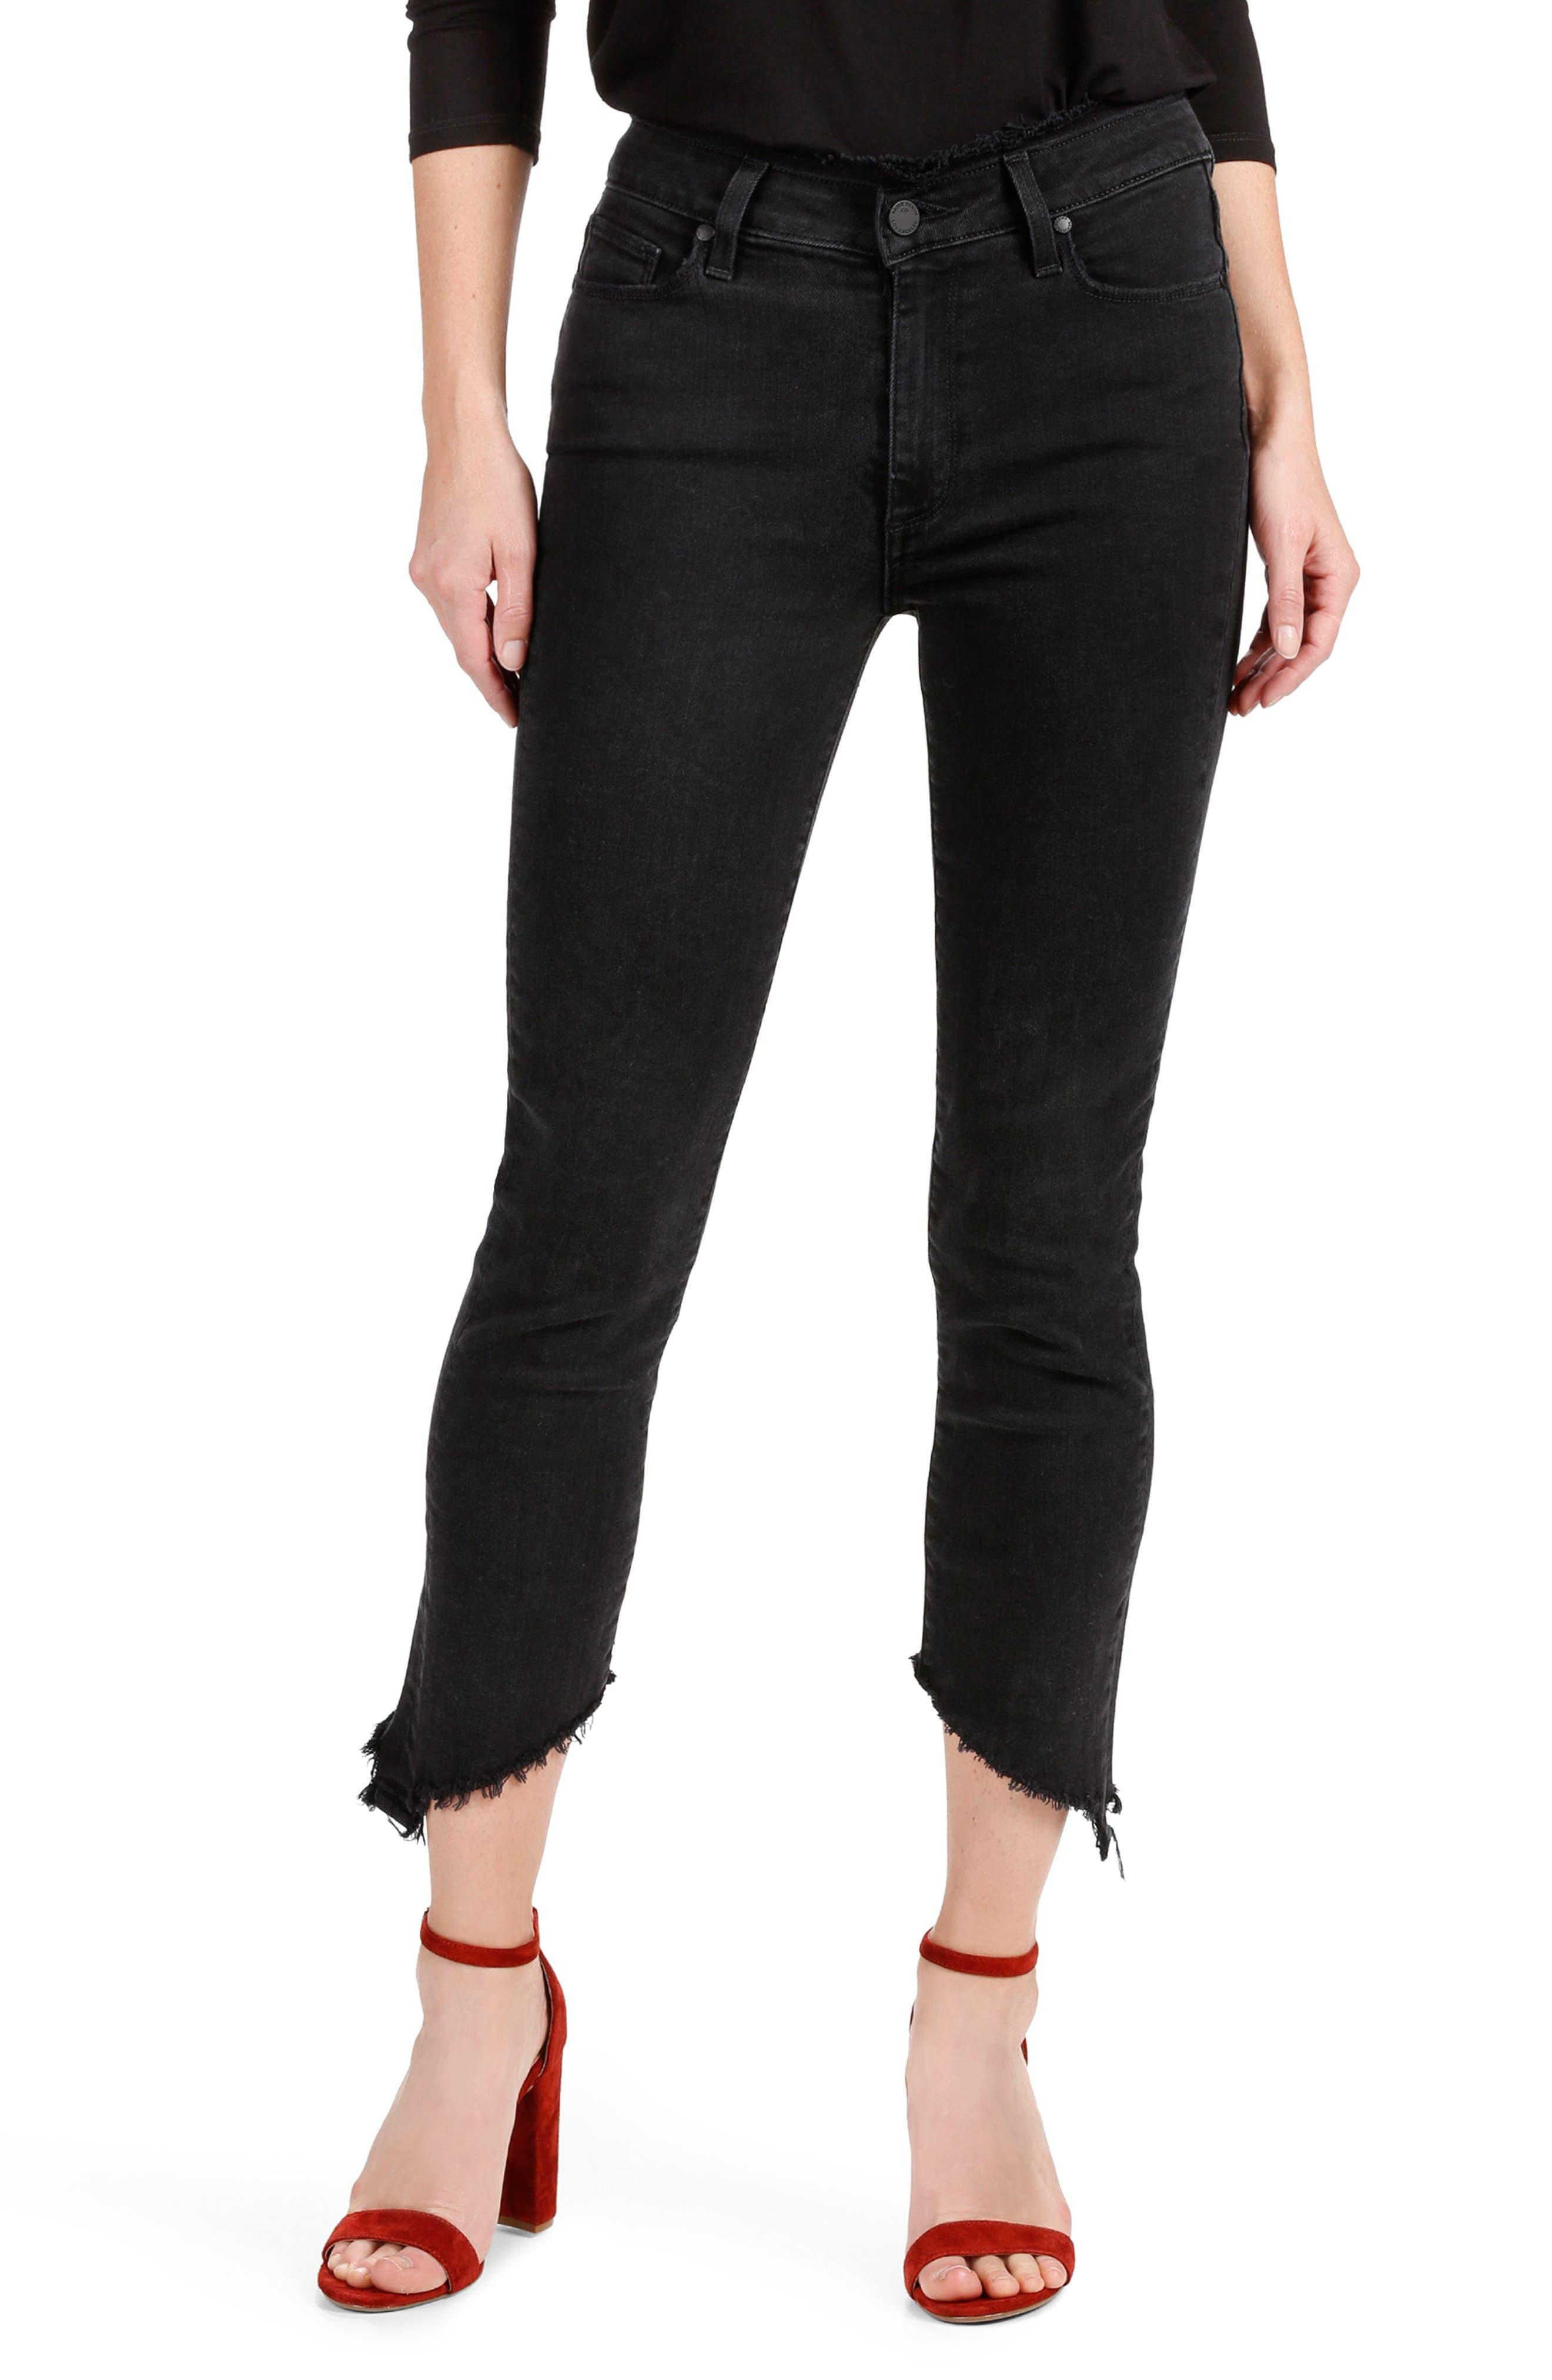 PAIGE Julia High Waist Straight Leg Jeans with Angled Hems (Midnight Noir)